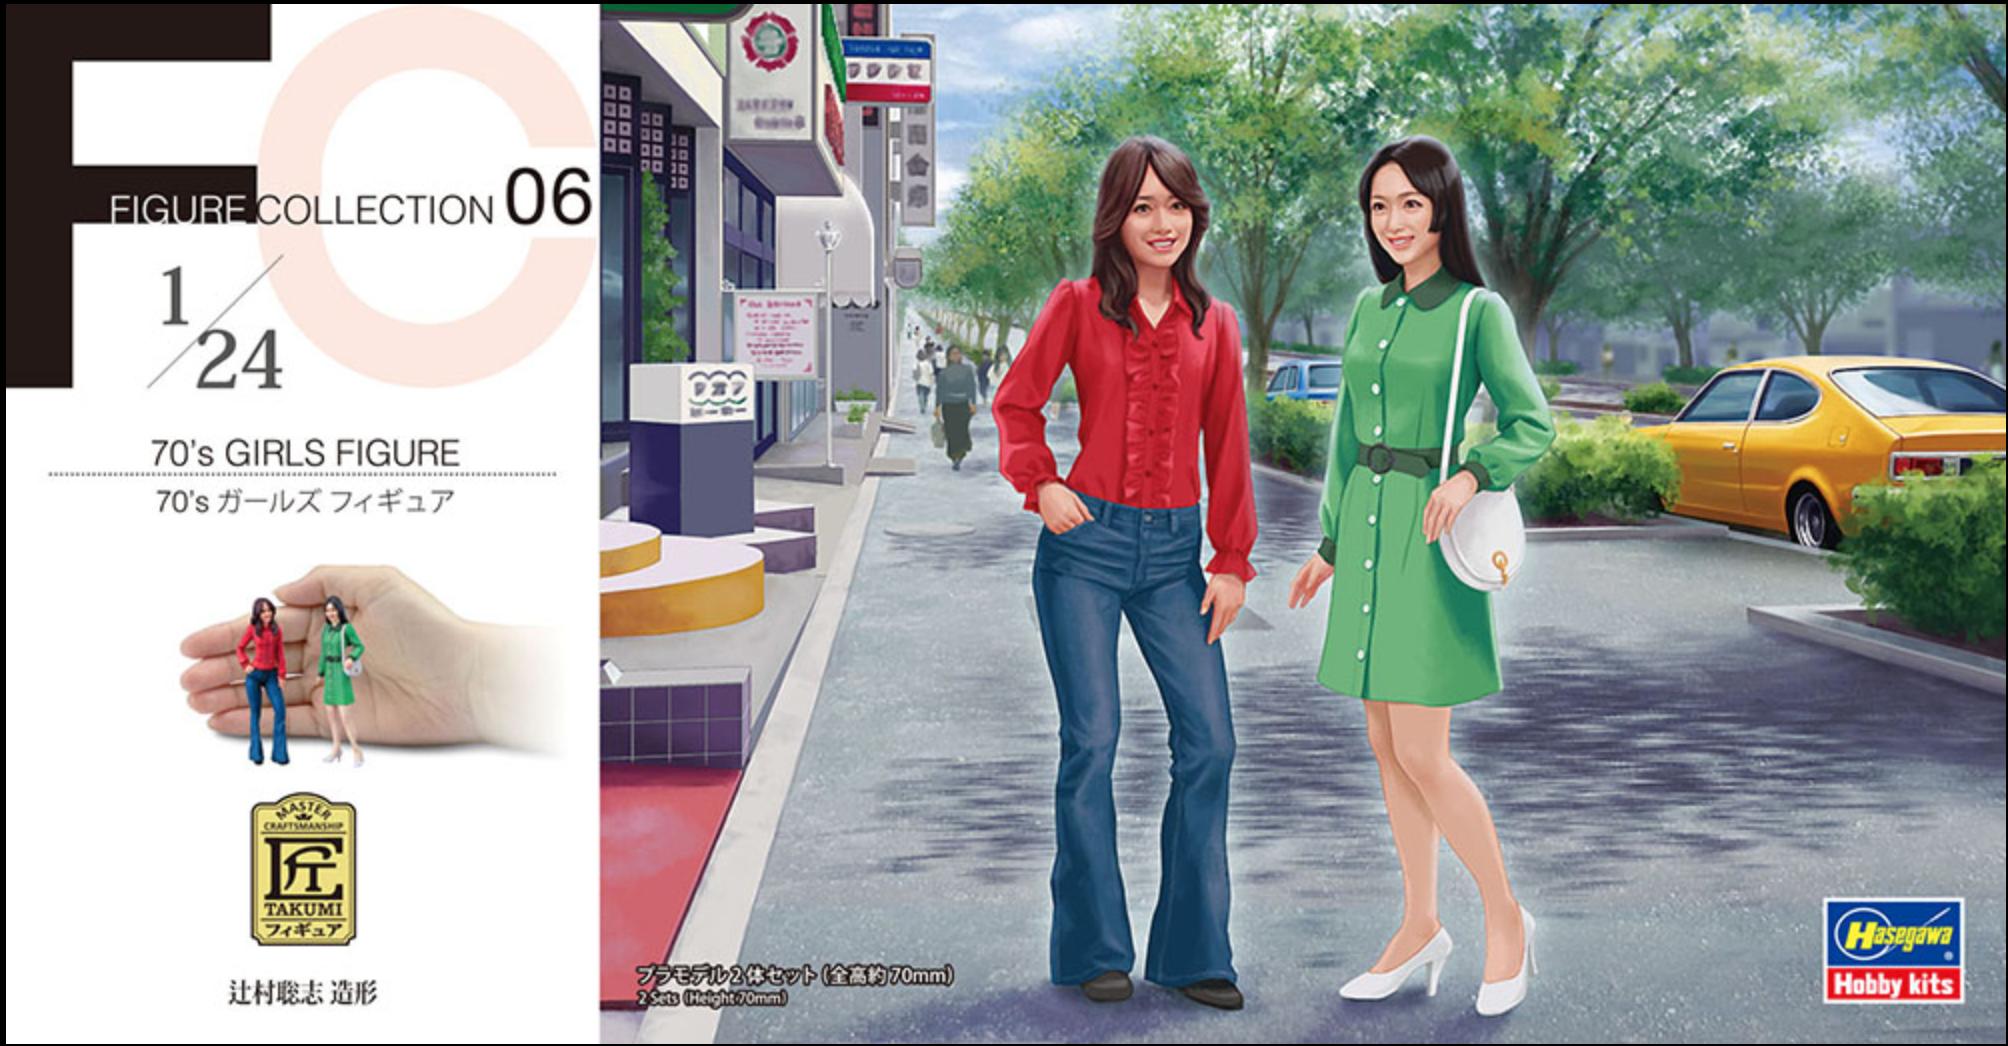 Hasegawa 1/24 70's GIRLS FIGURE FC06